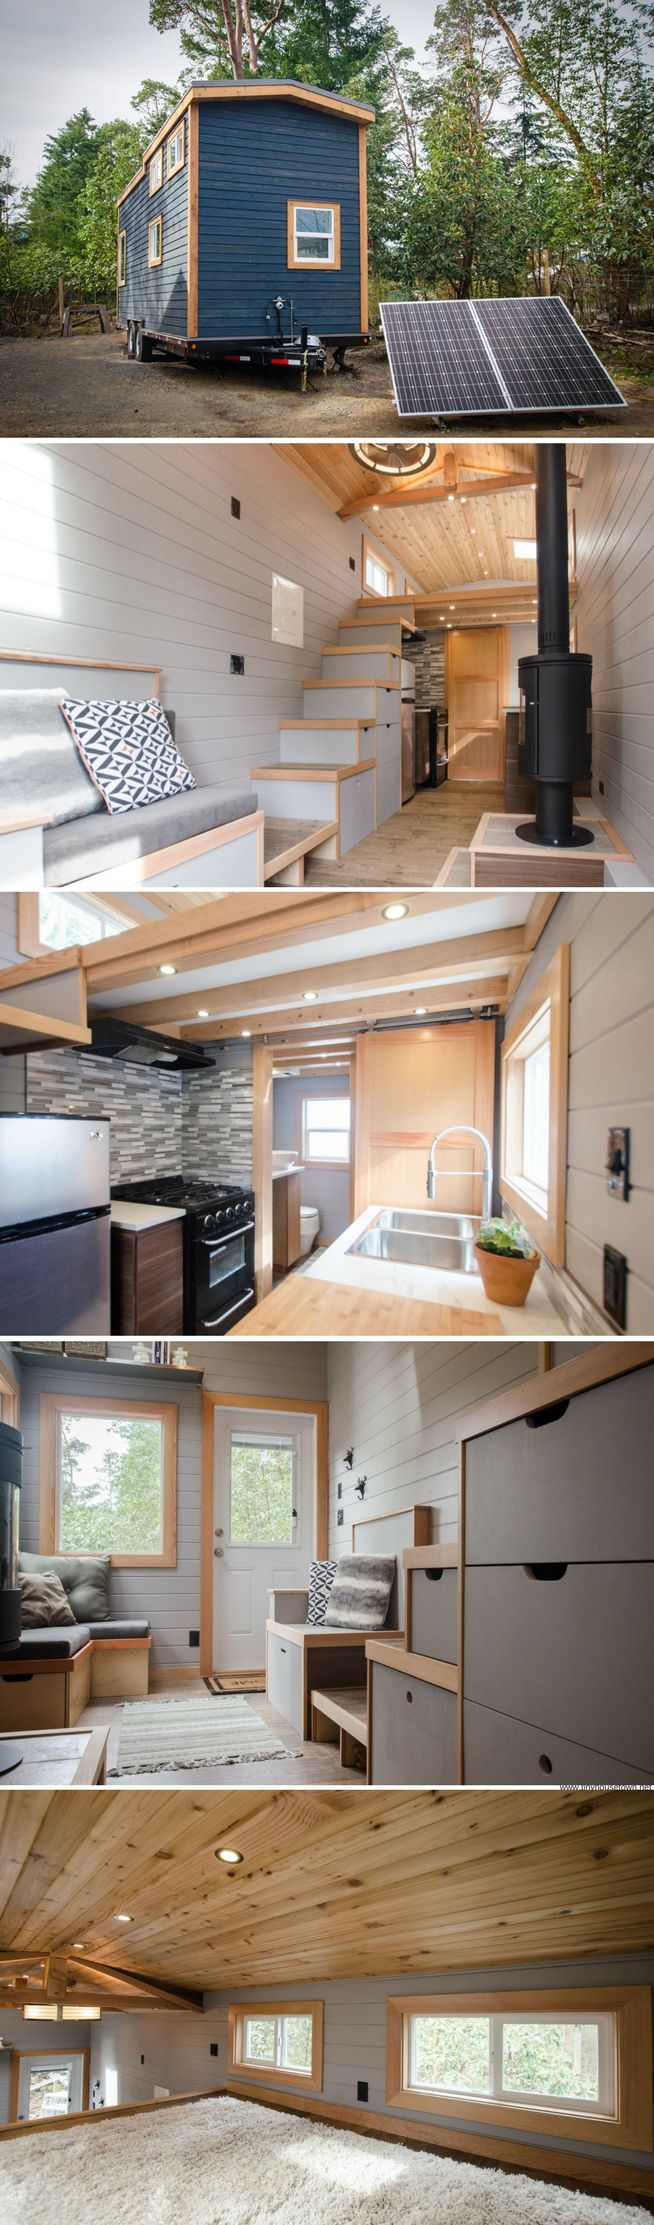 The Blue Heron tiny house (250 sq ft)